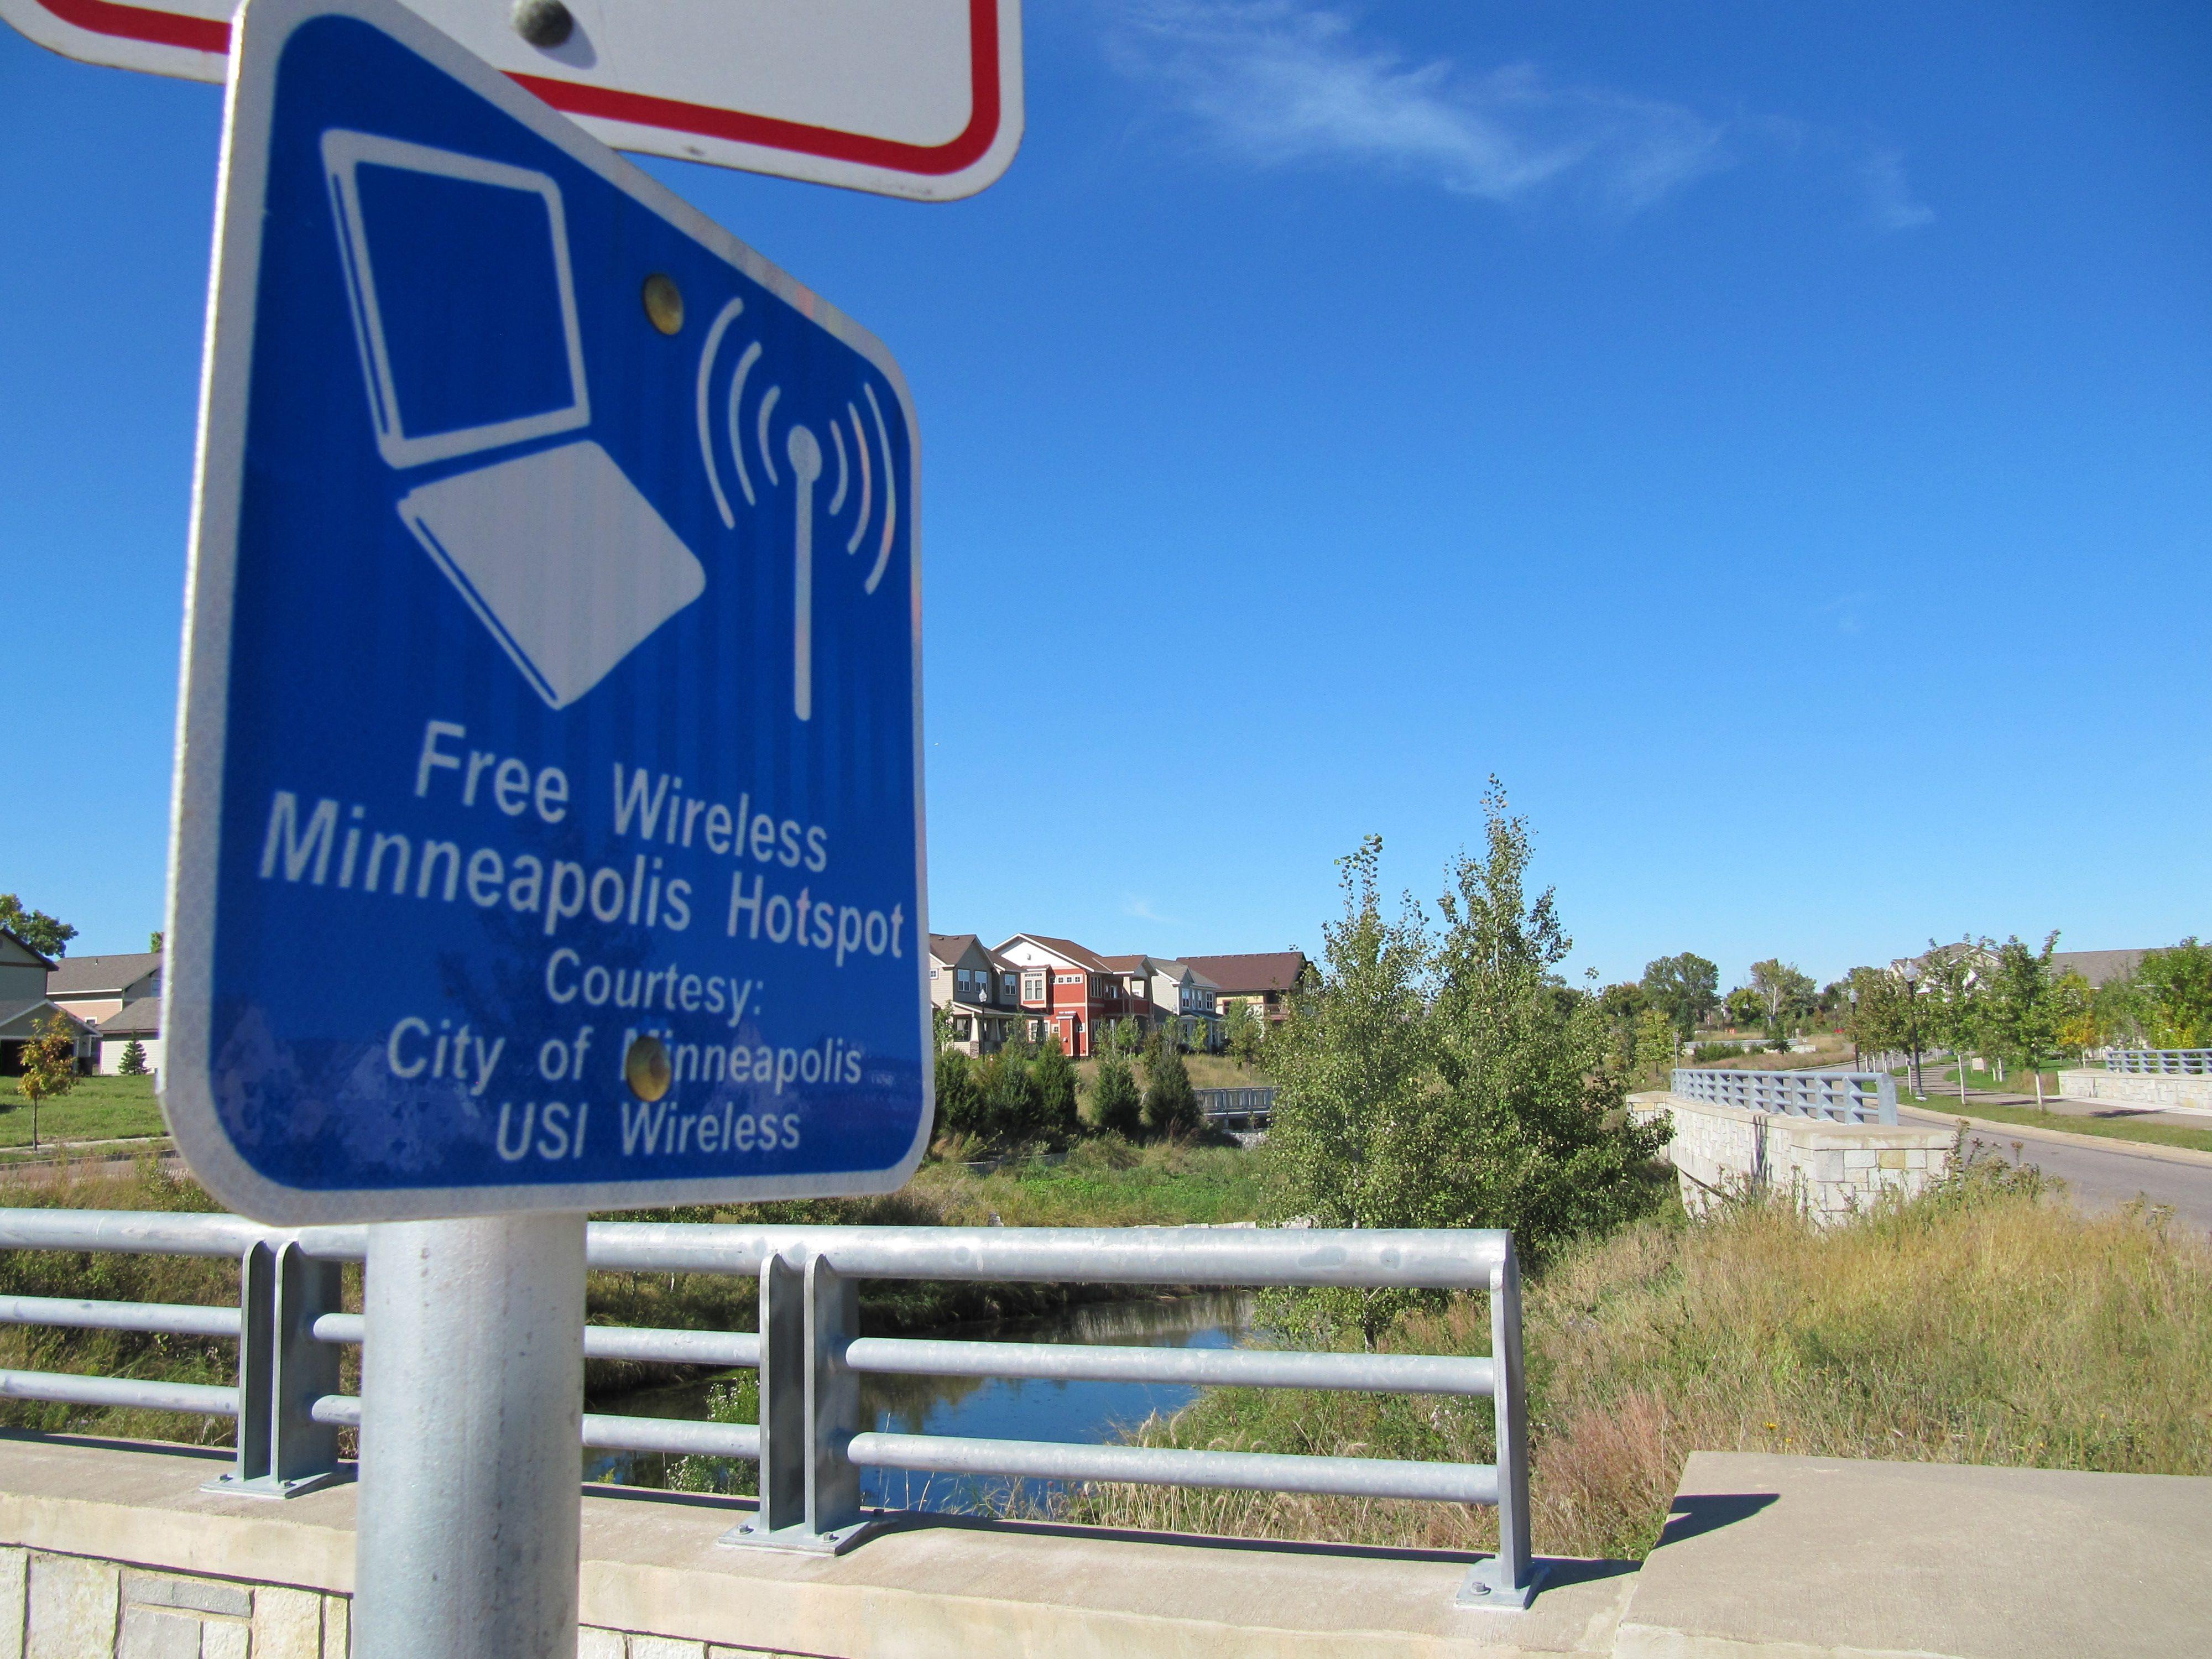 Minneapolis free Wi-Fi sign